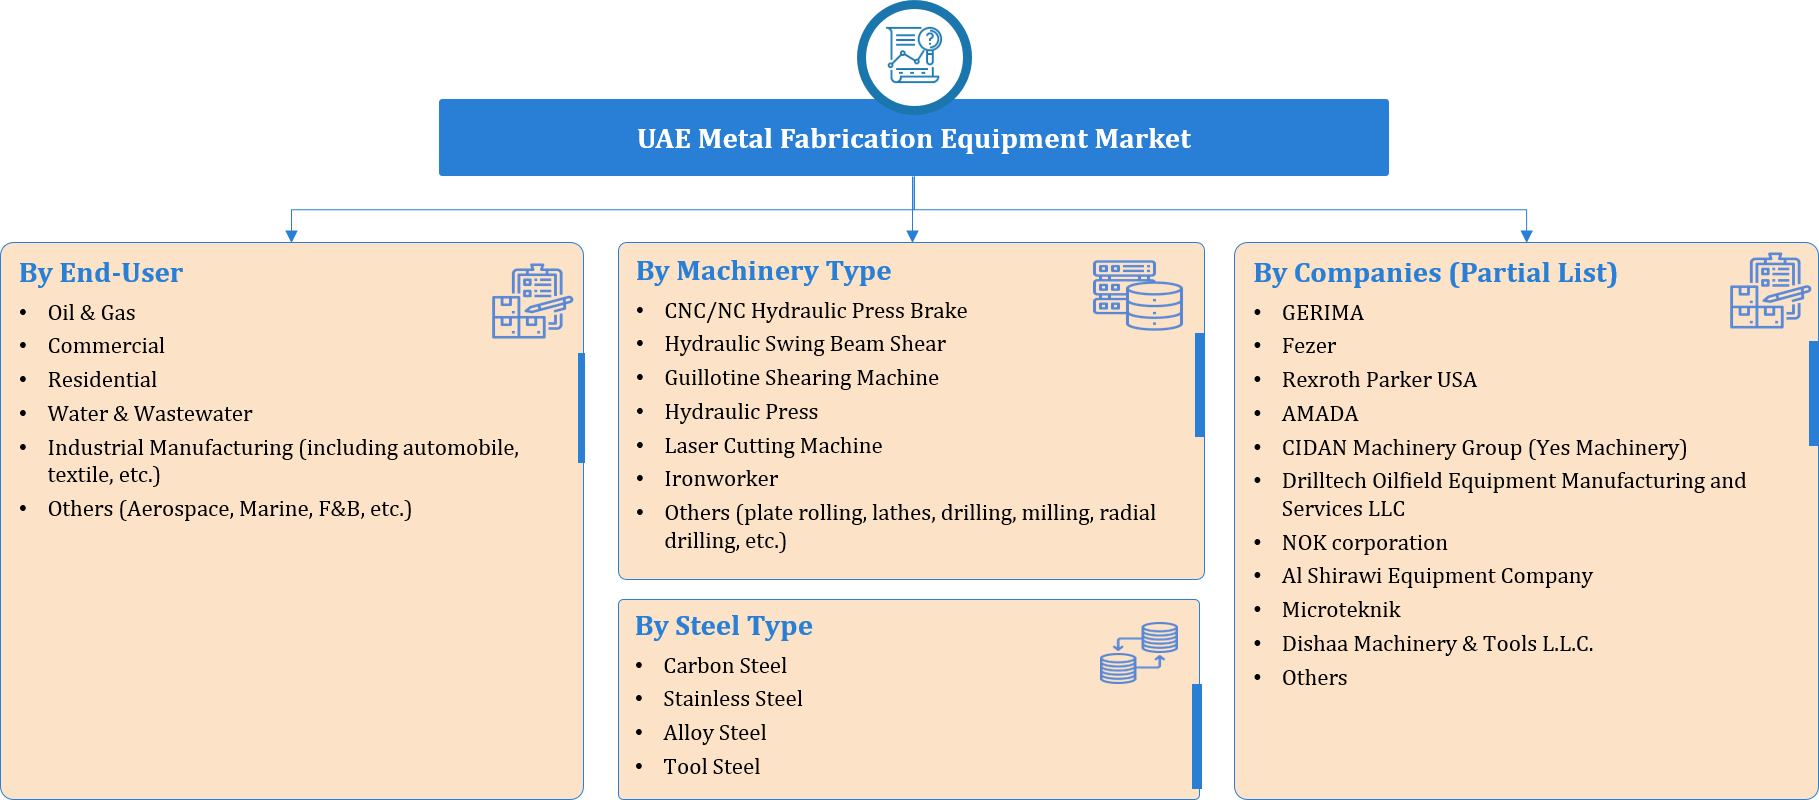 UAE Metal Fabrication Equipment Market Segmentation